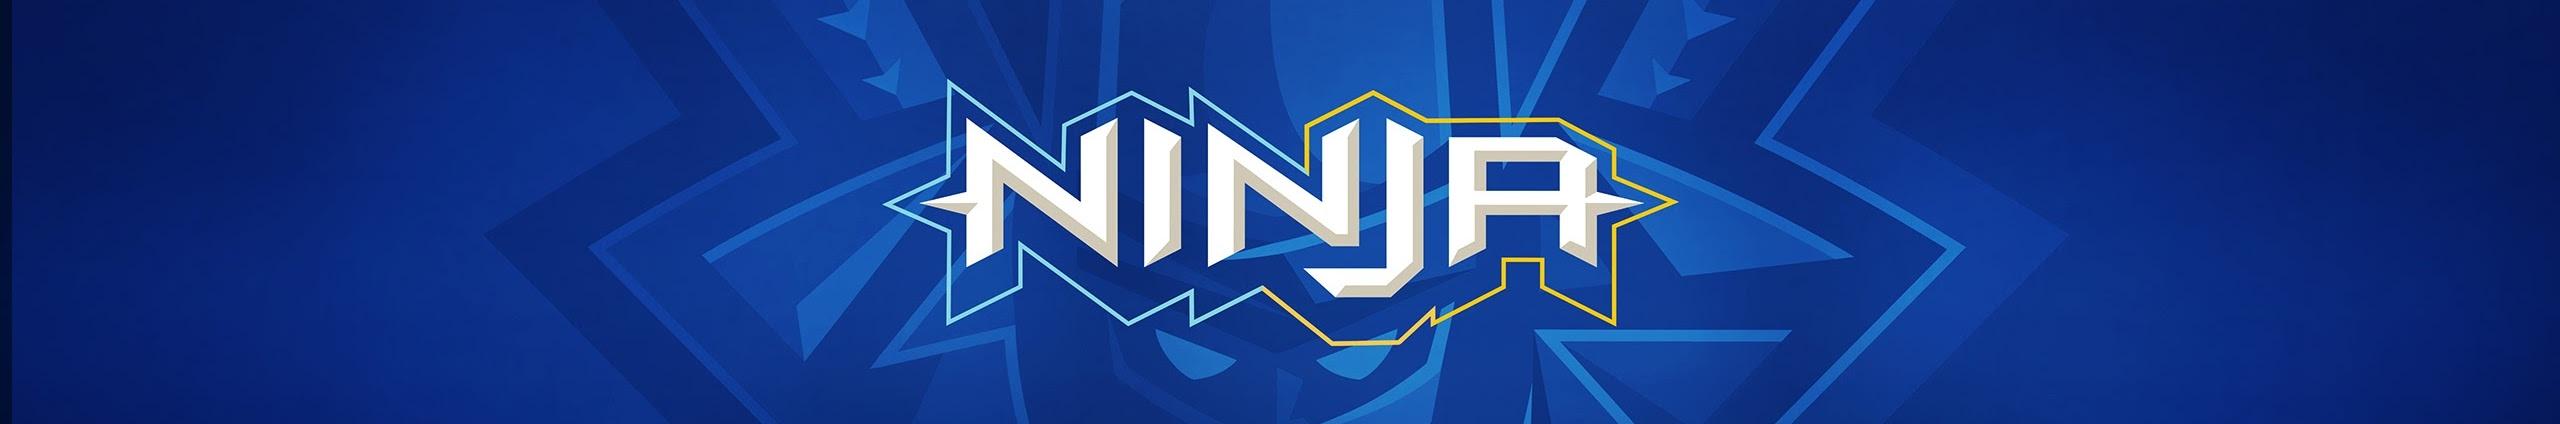 Ninja Fortnite Settings - Fortnite Info